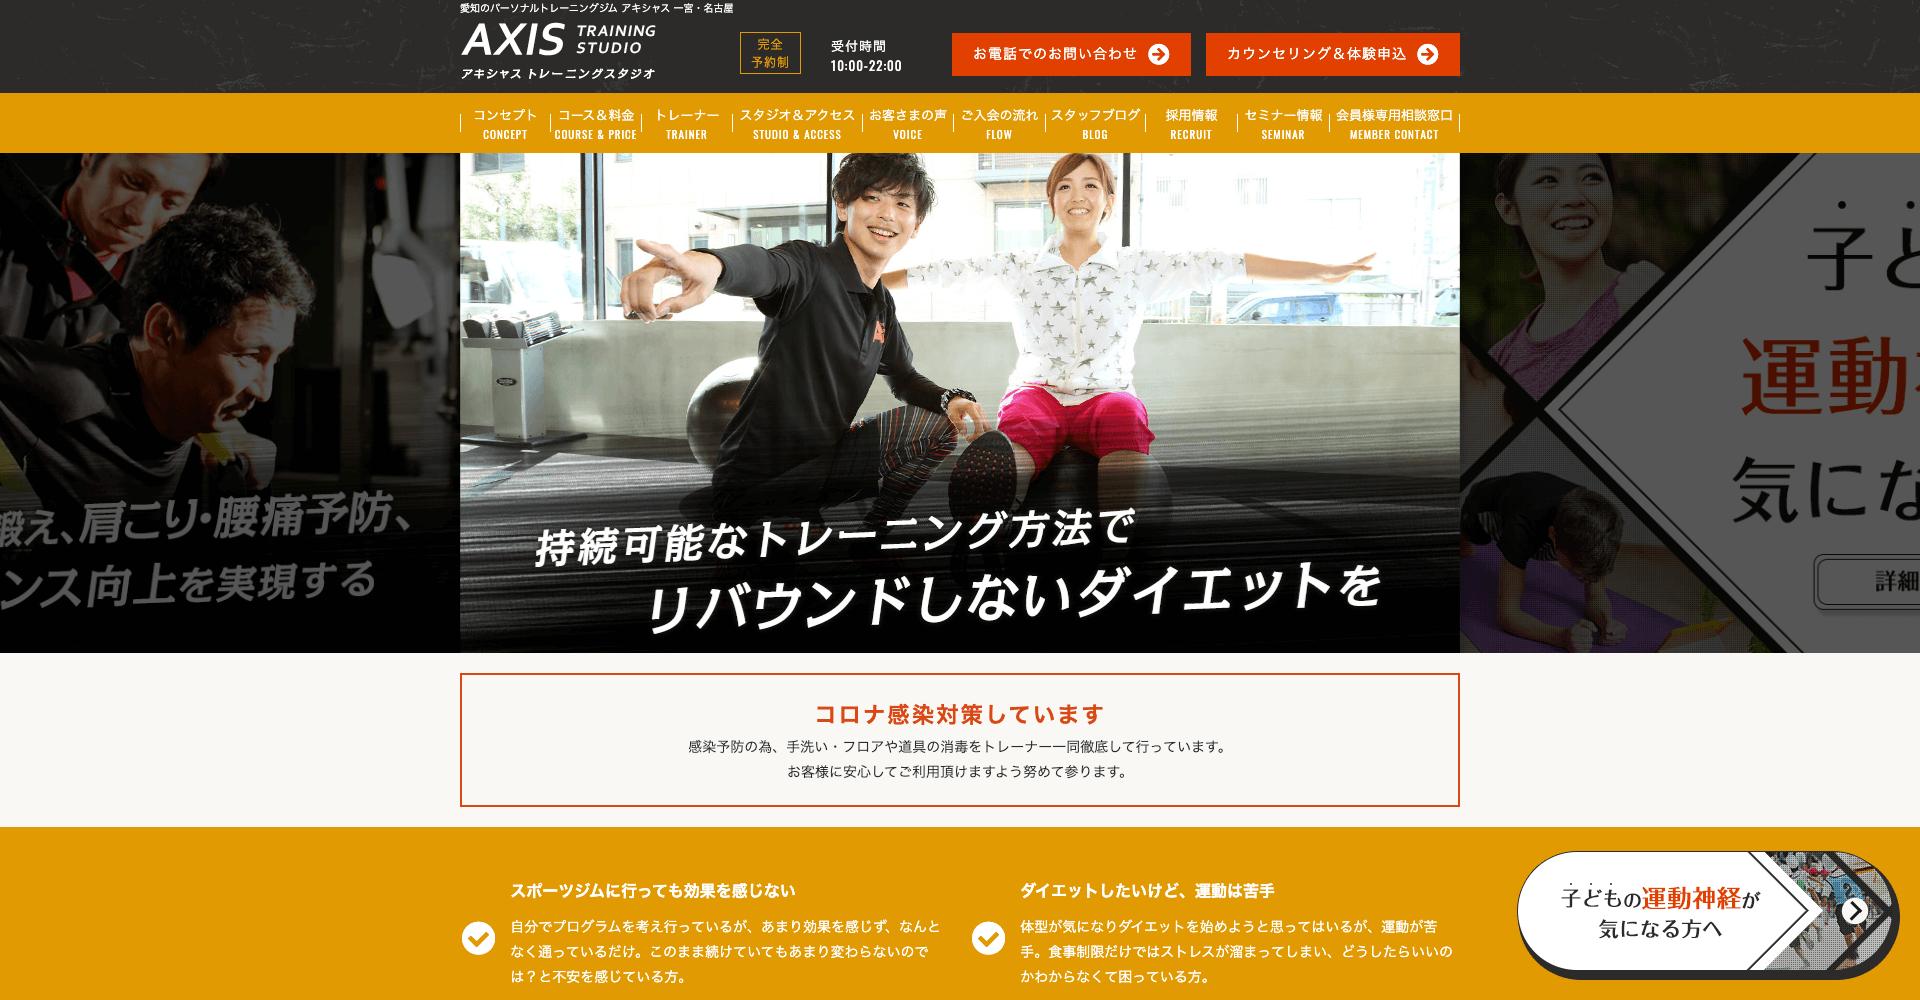 AXIS TRANING STUDIO 原店 パーソナルトレーニングジム